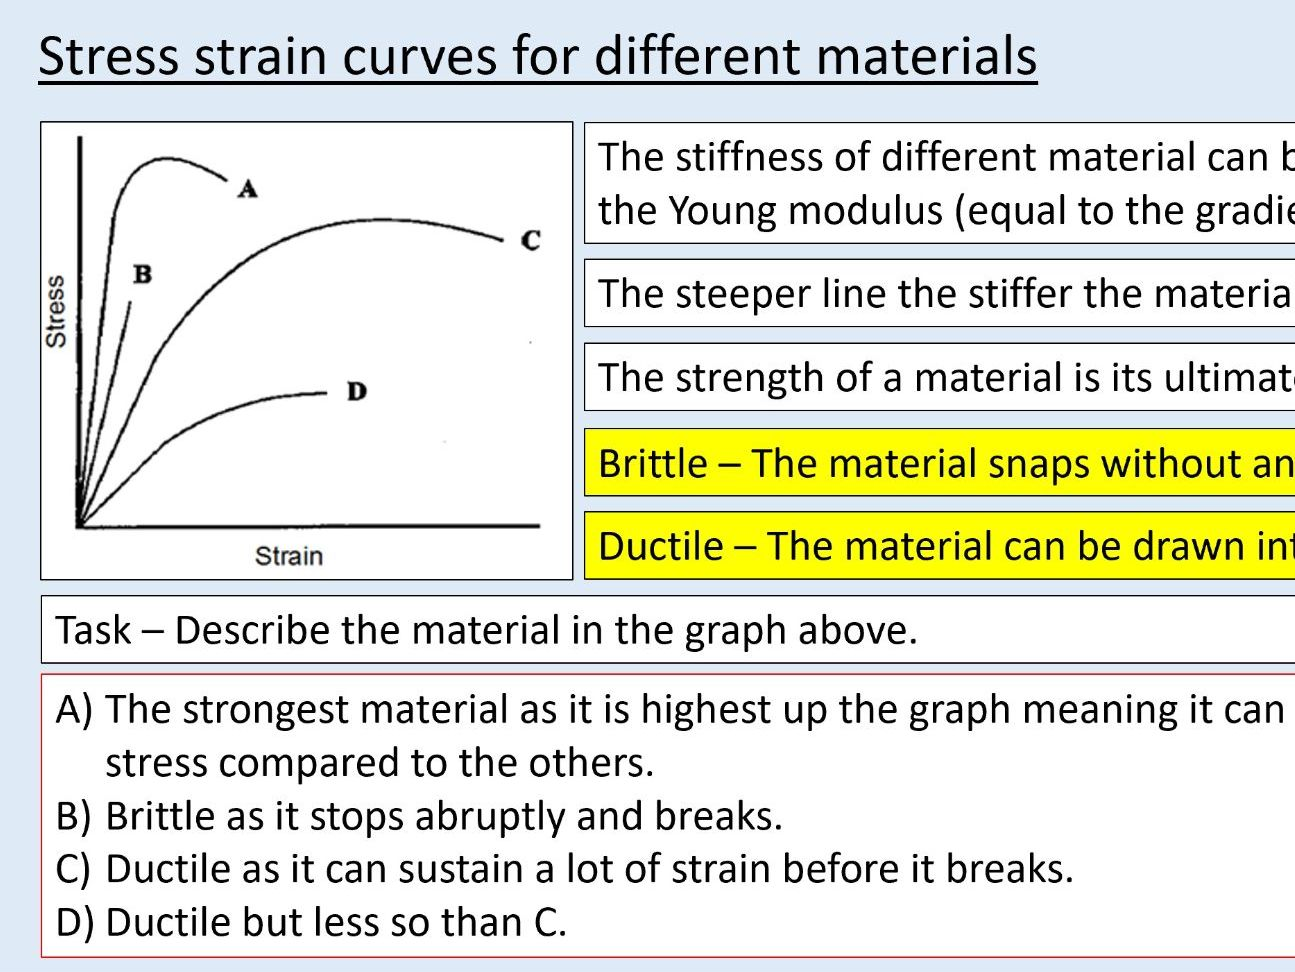 (Chapter 11 BUNDLE) A level Physics - Mechanics and materials - Materials